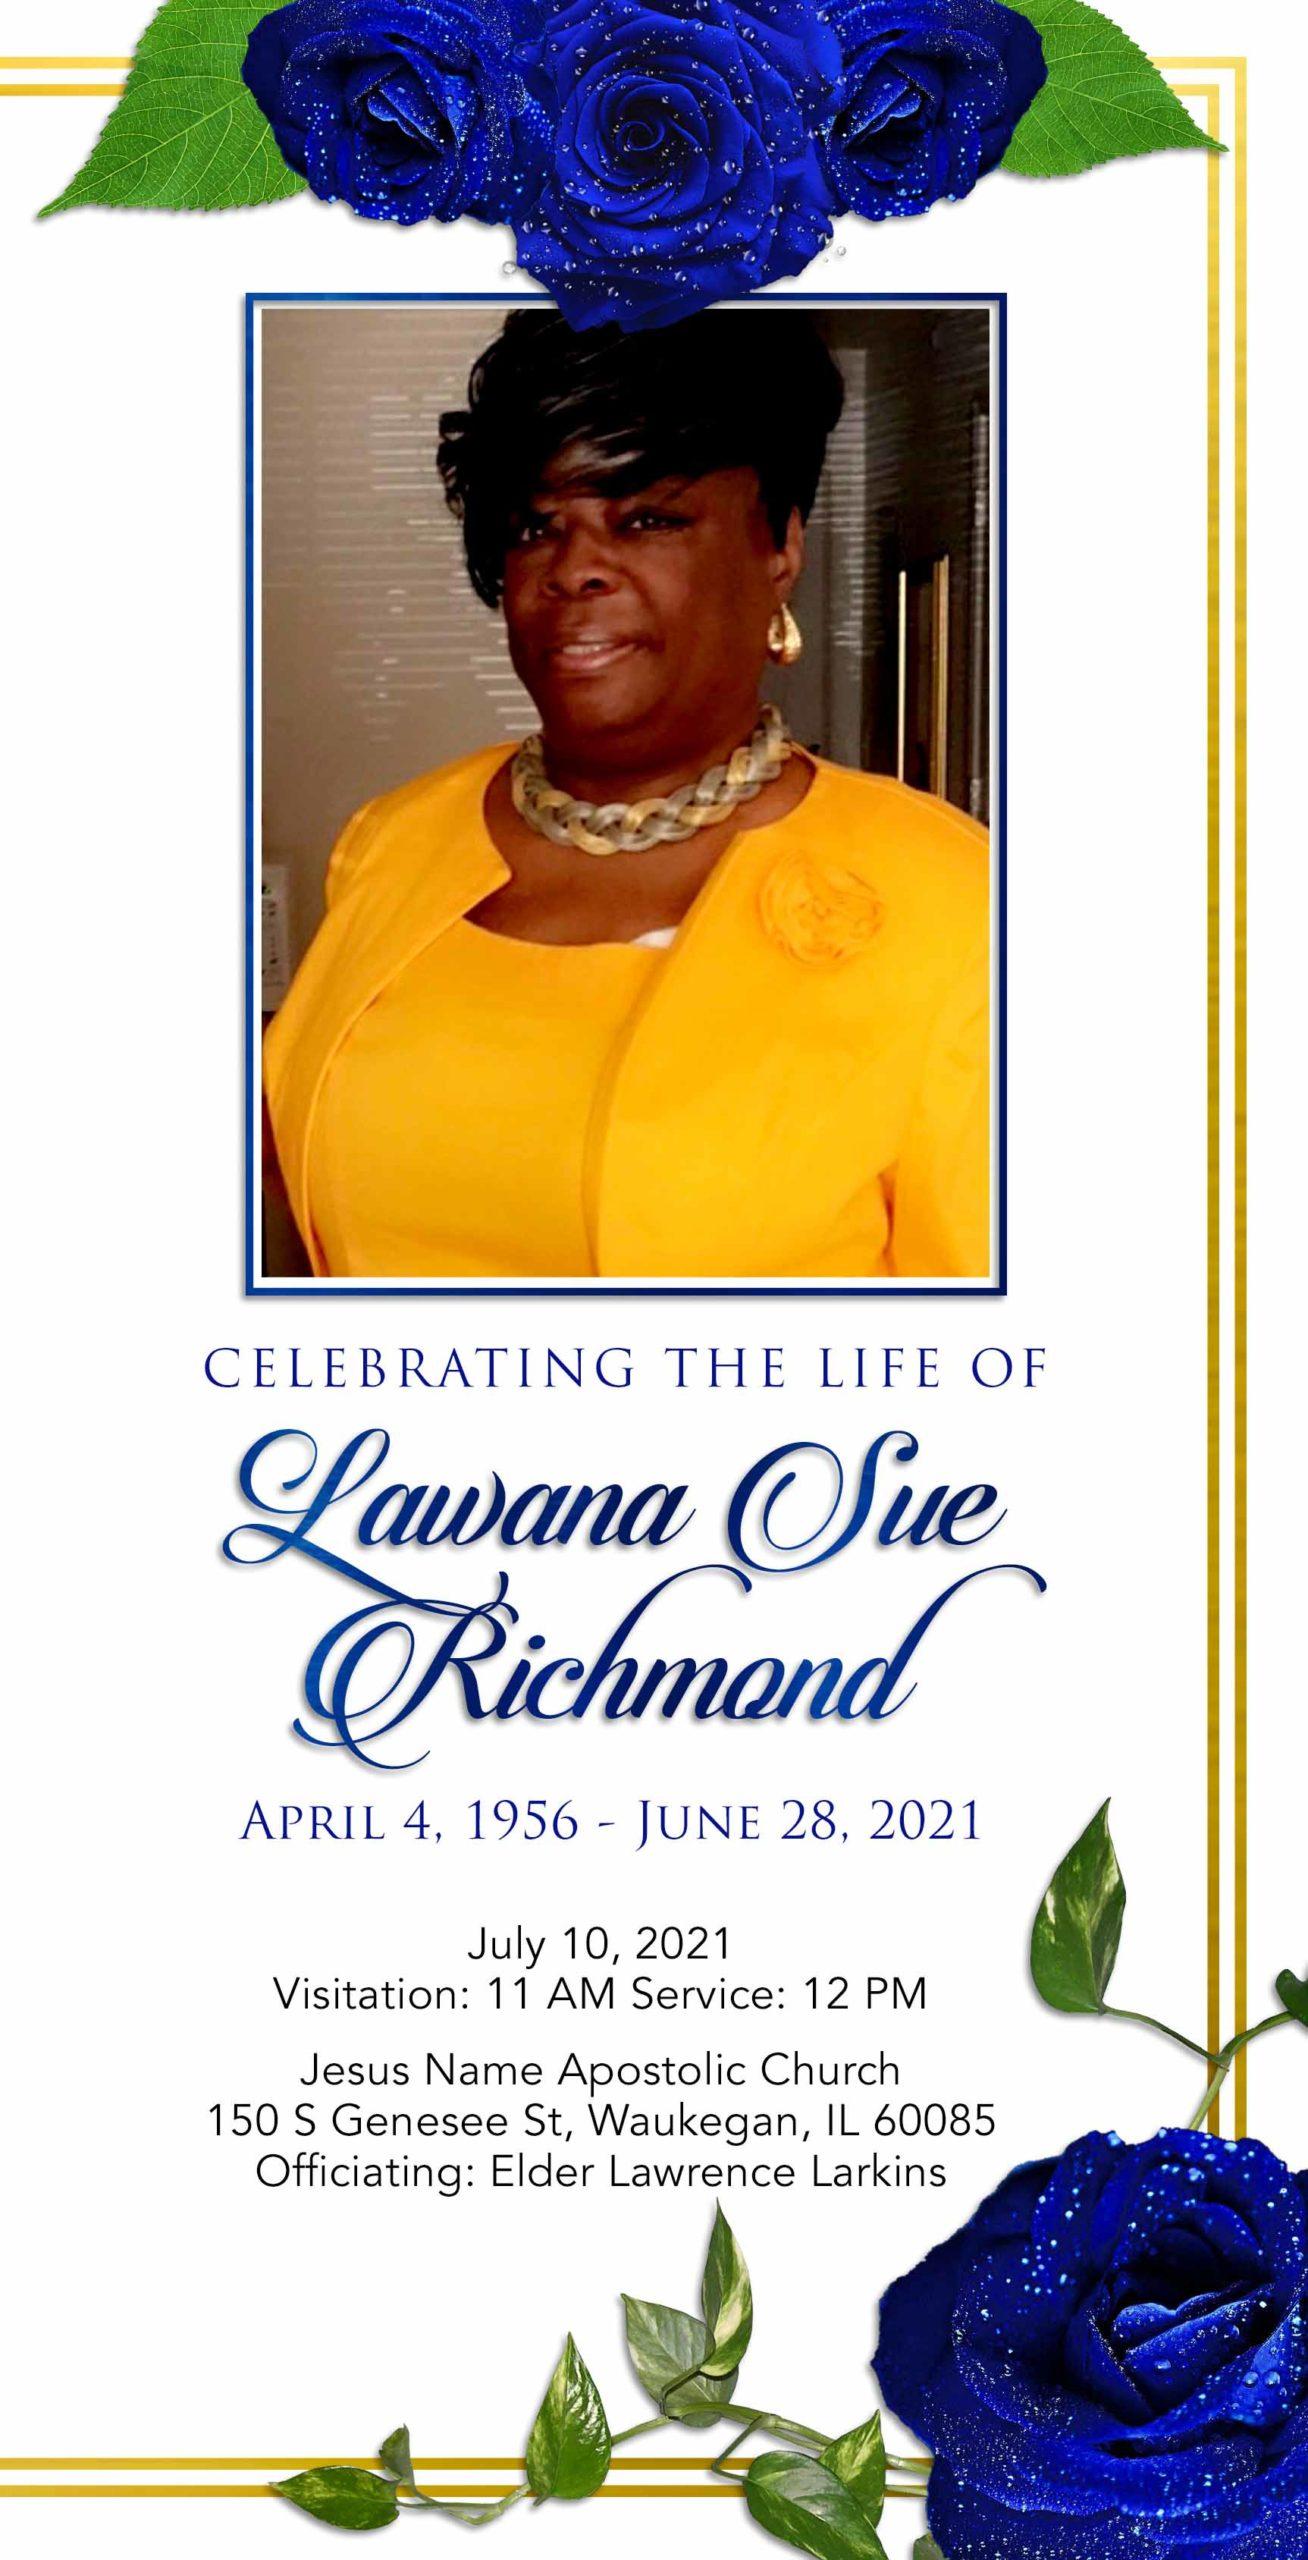 Lawana Sue Richmond 1956 – 2021